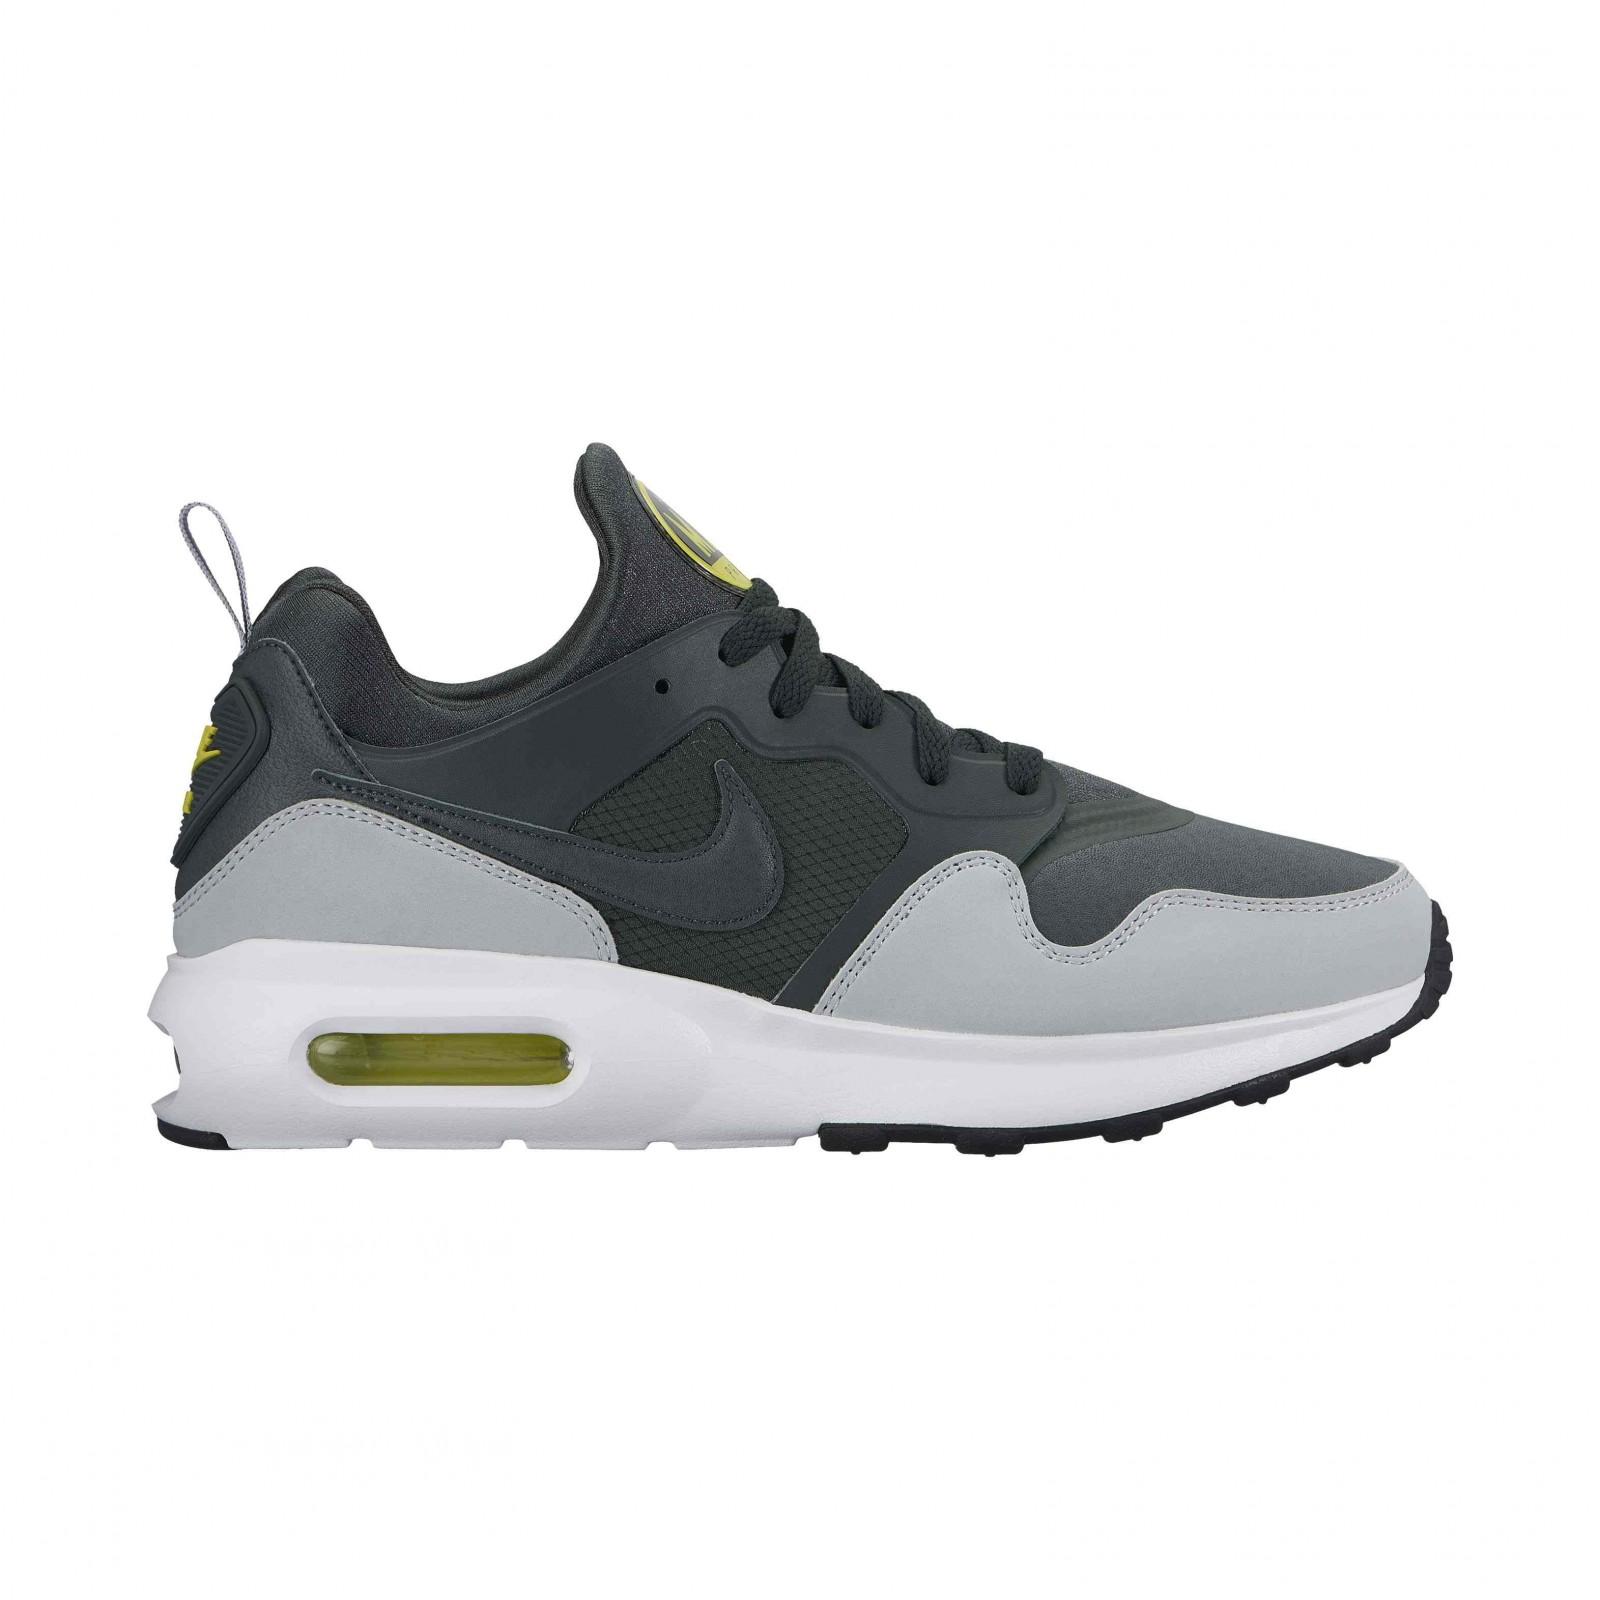 Pánské tenisky Nike AIR MAX PRIME SL  773e24948e3